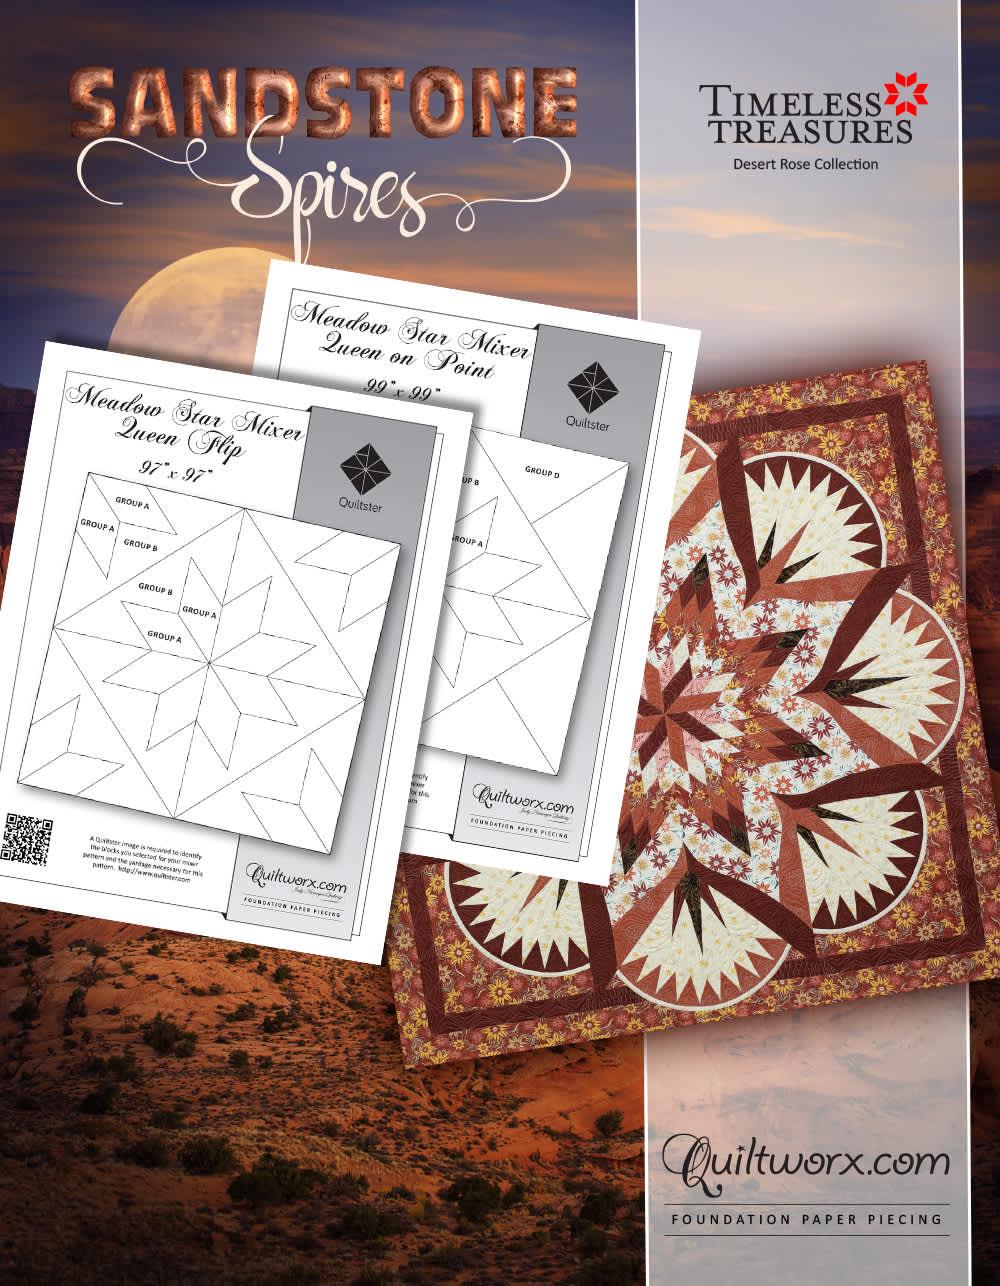 Sandstone Spires Queen Expansion